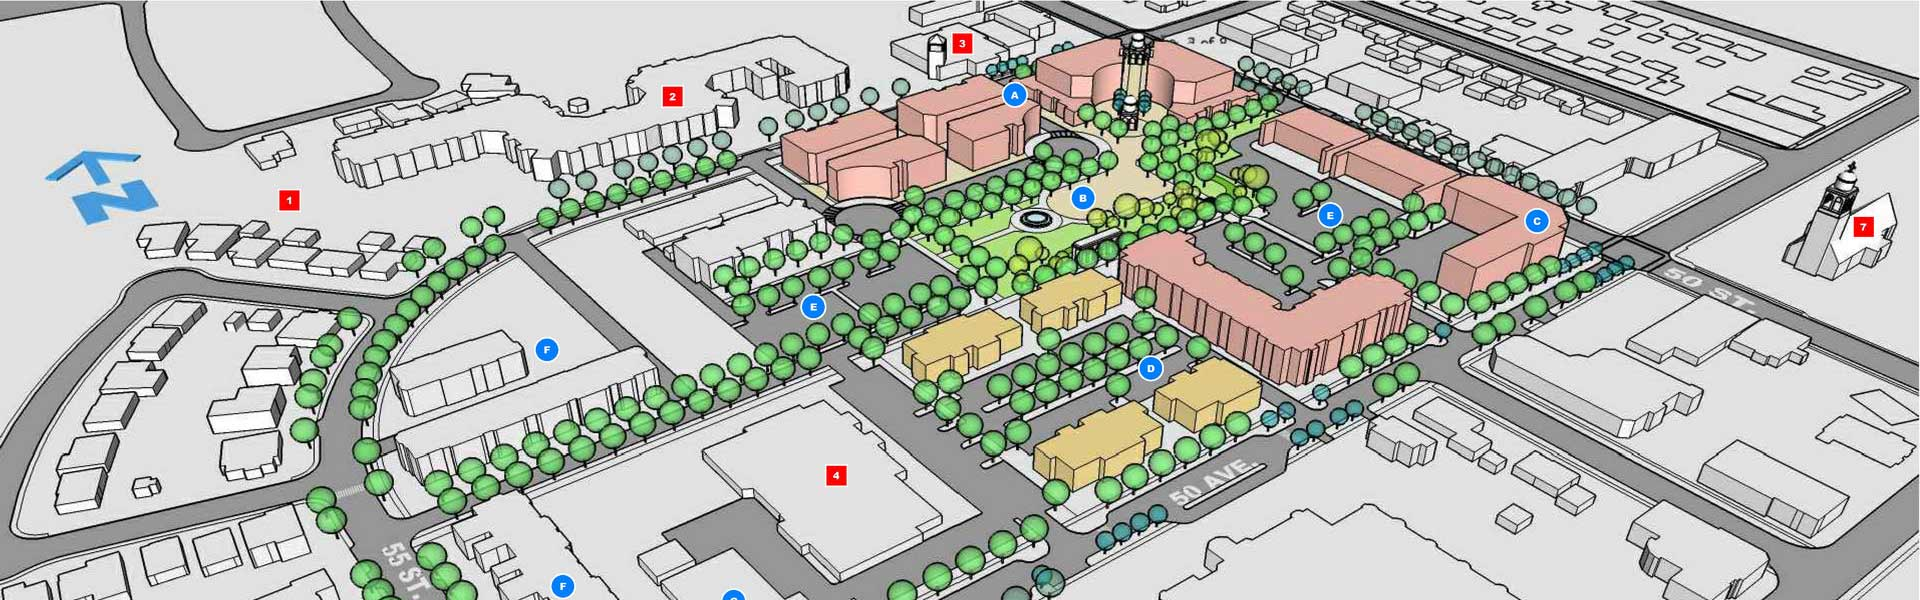 Town of Beaumont Urban Design Plan